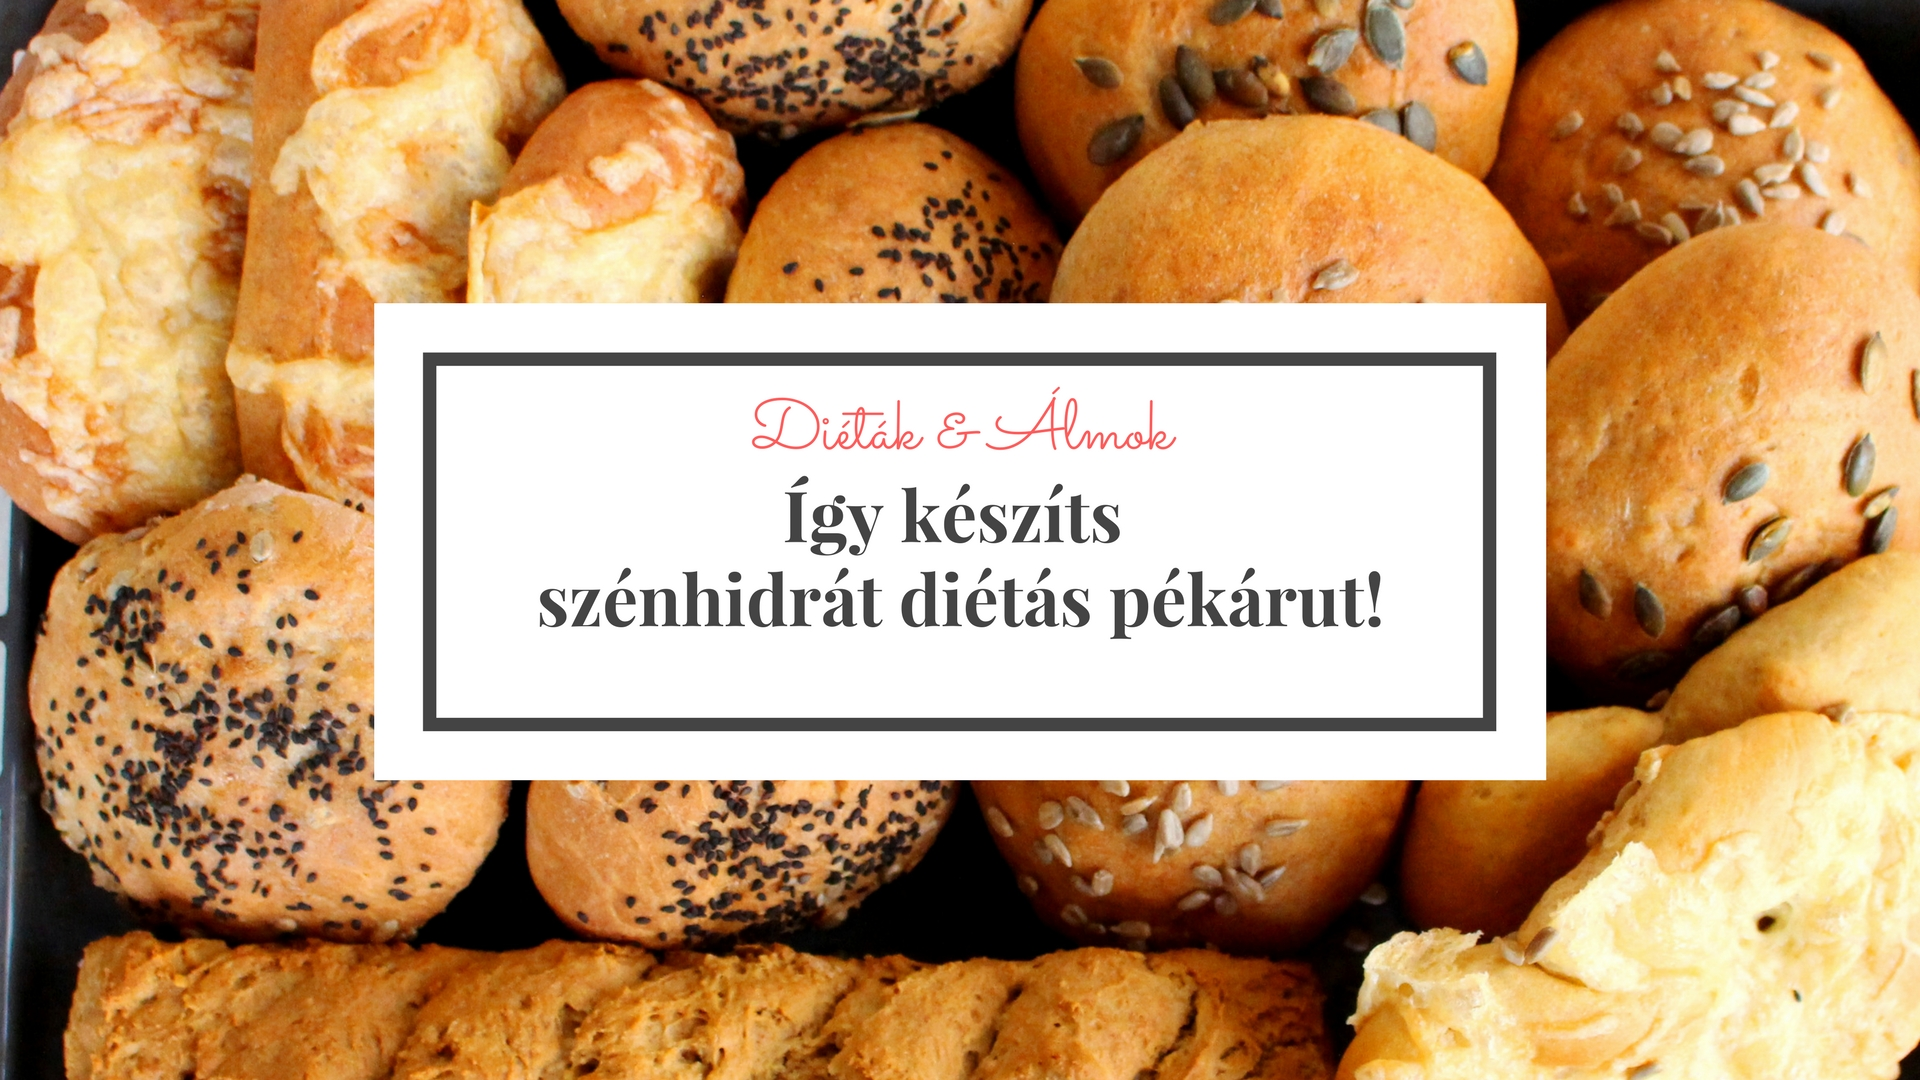 dietak_almok_nyari_szenhidrat_dieta_tanfolyam_pekaru_1.jpg